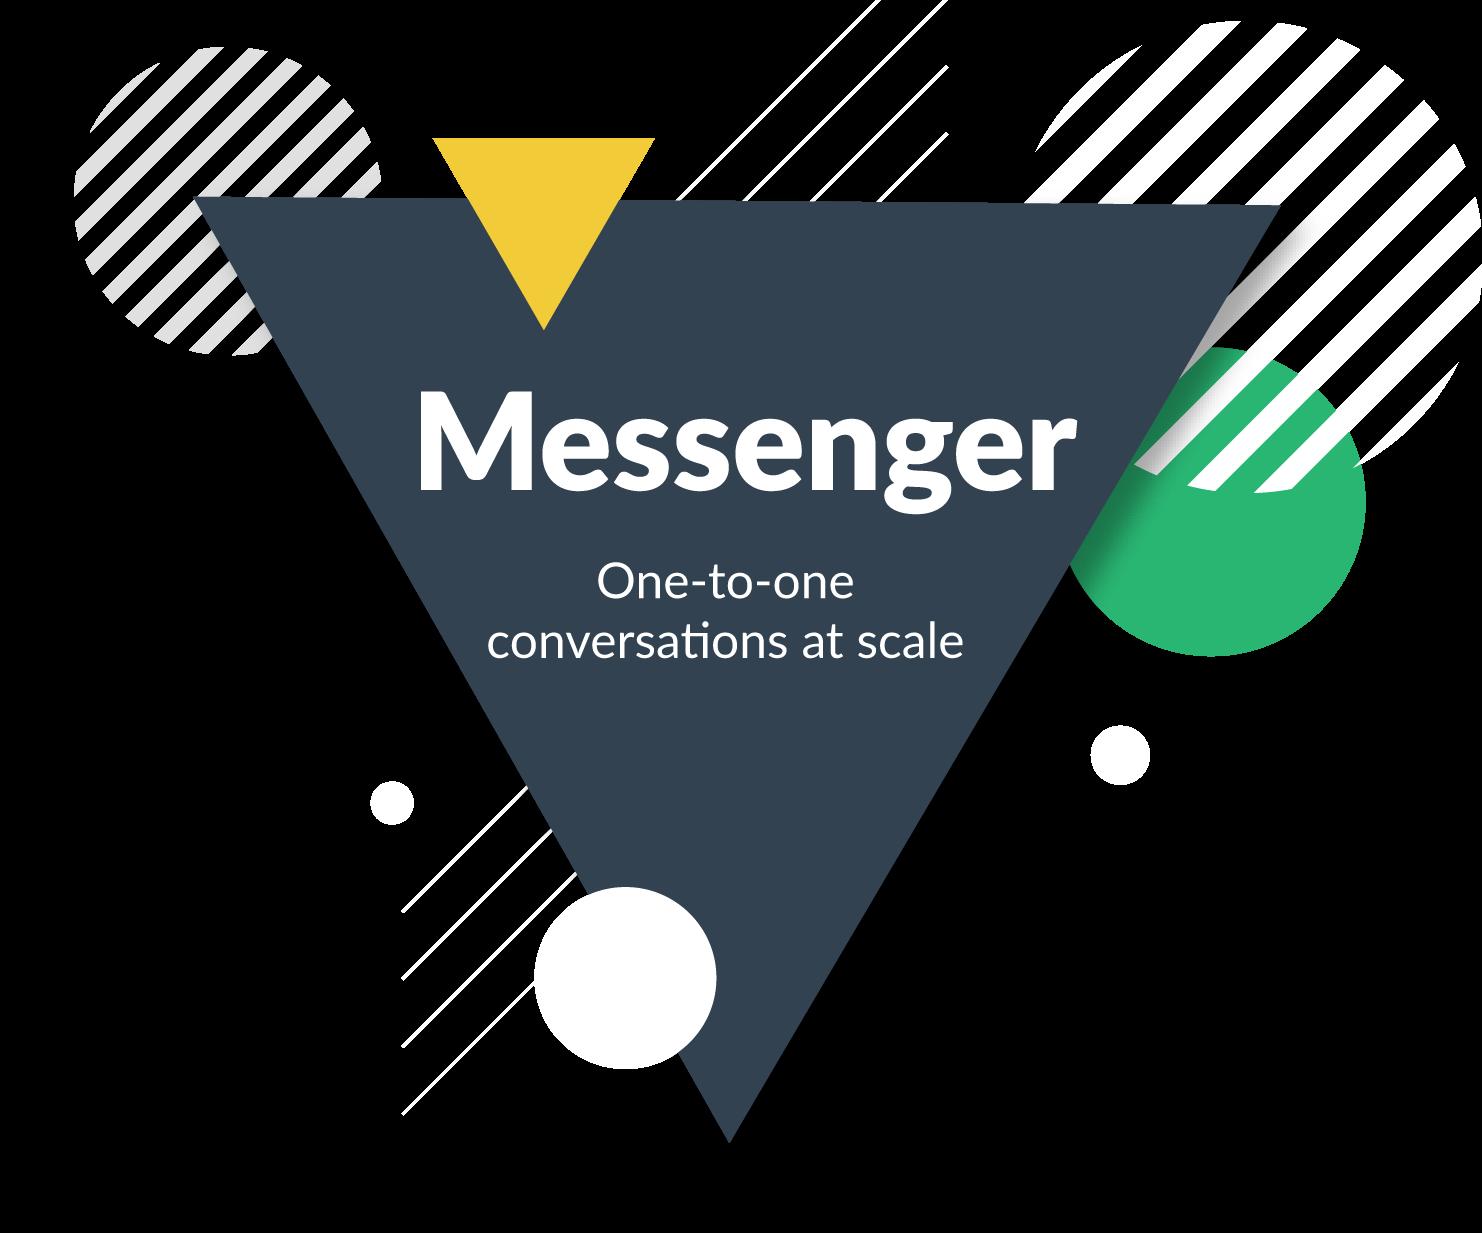 Messenger Graphic